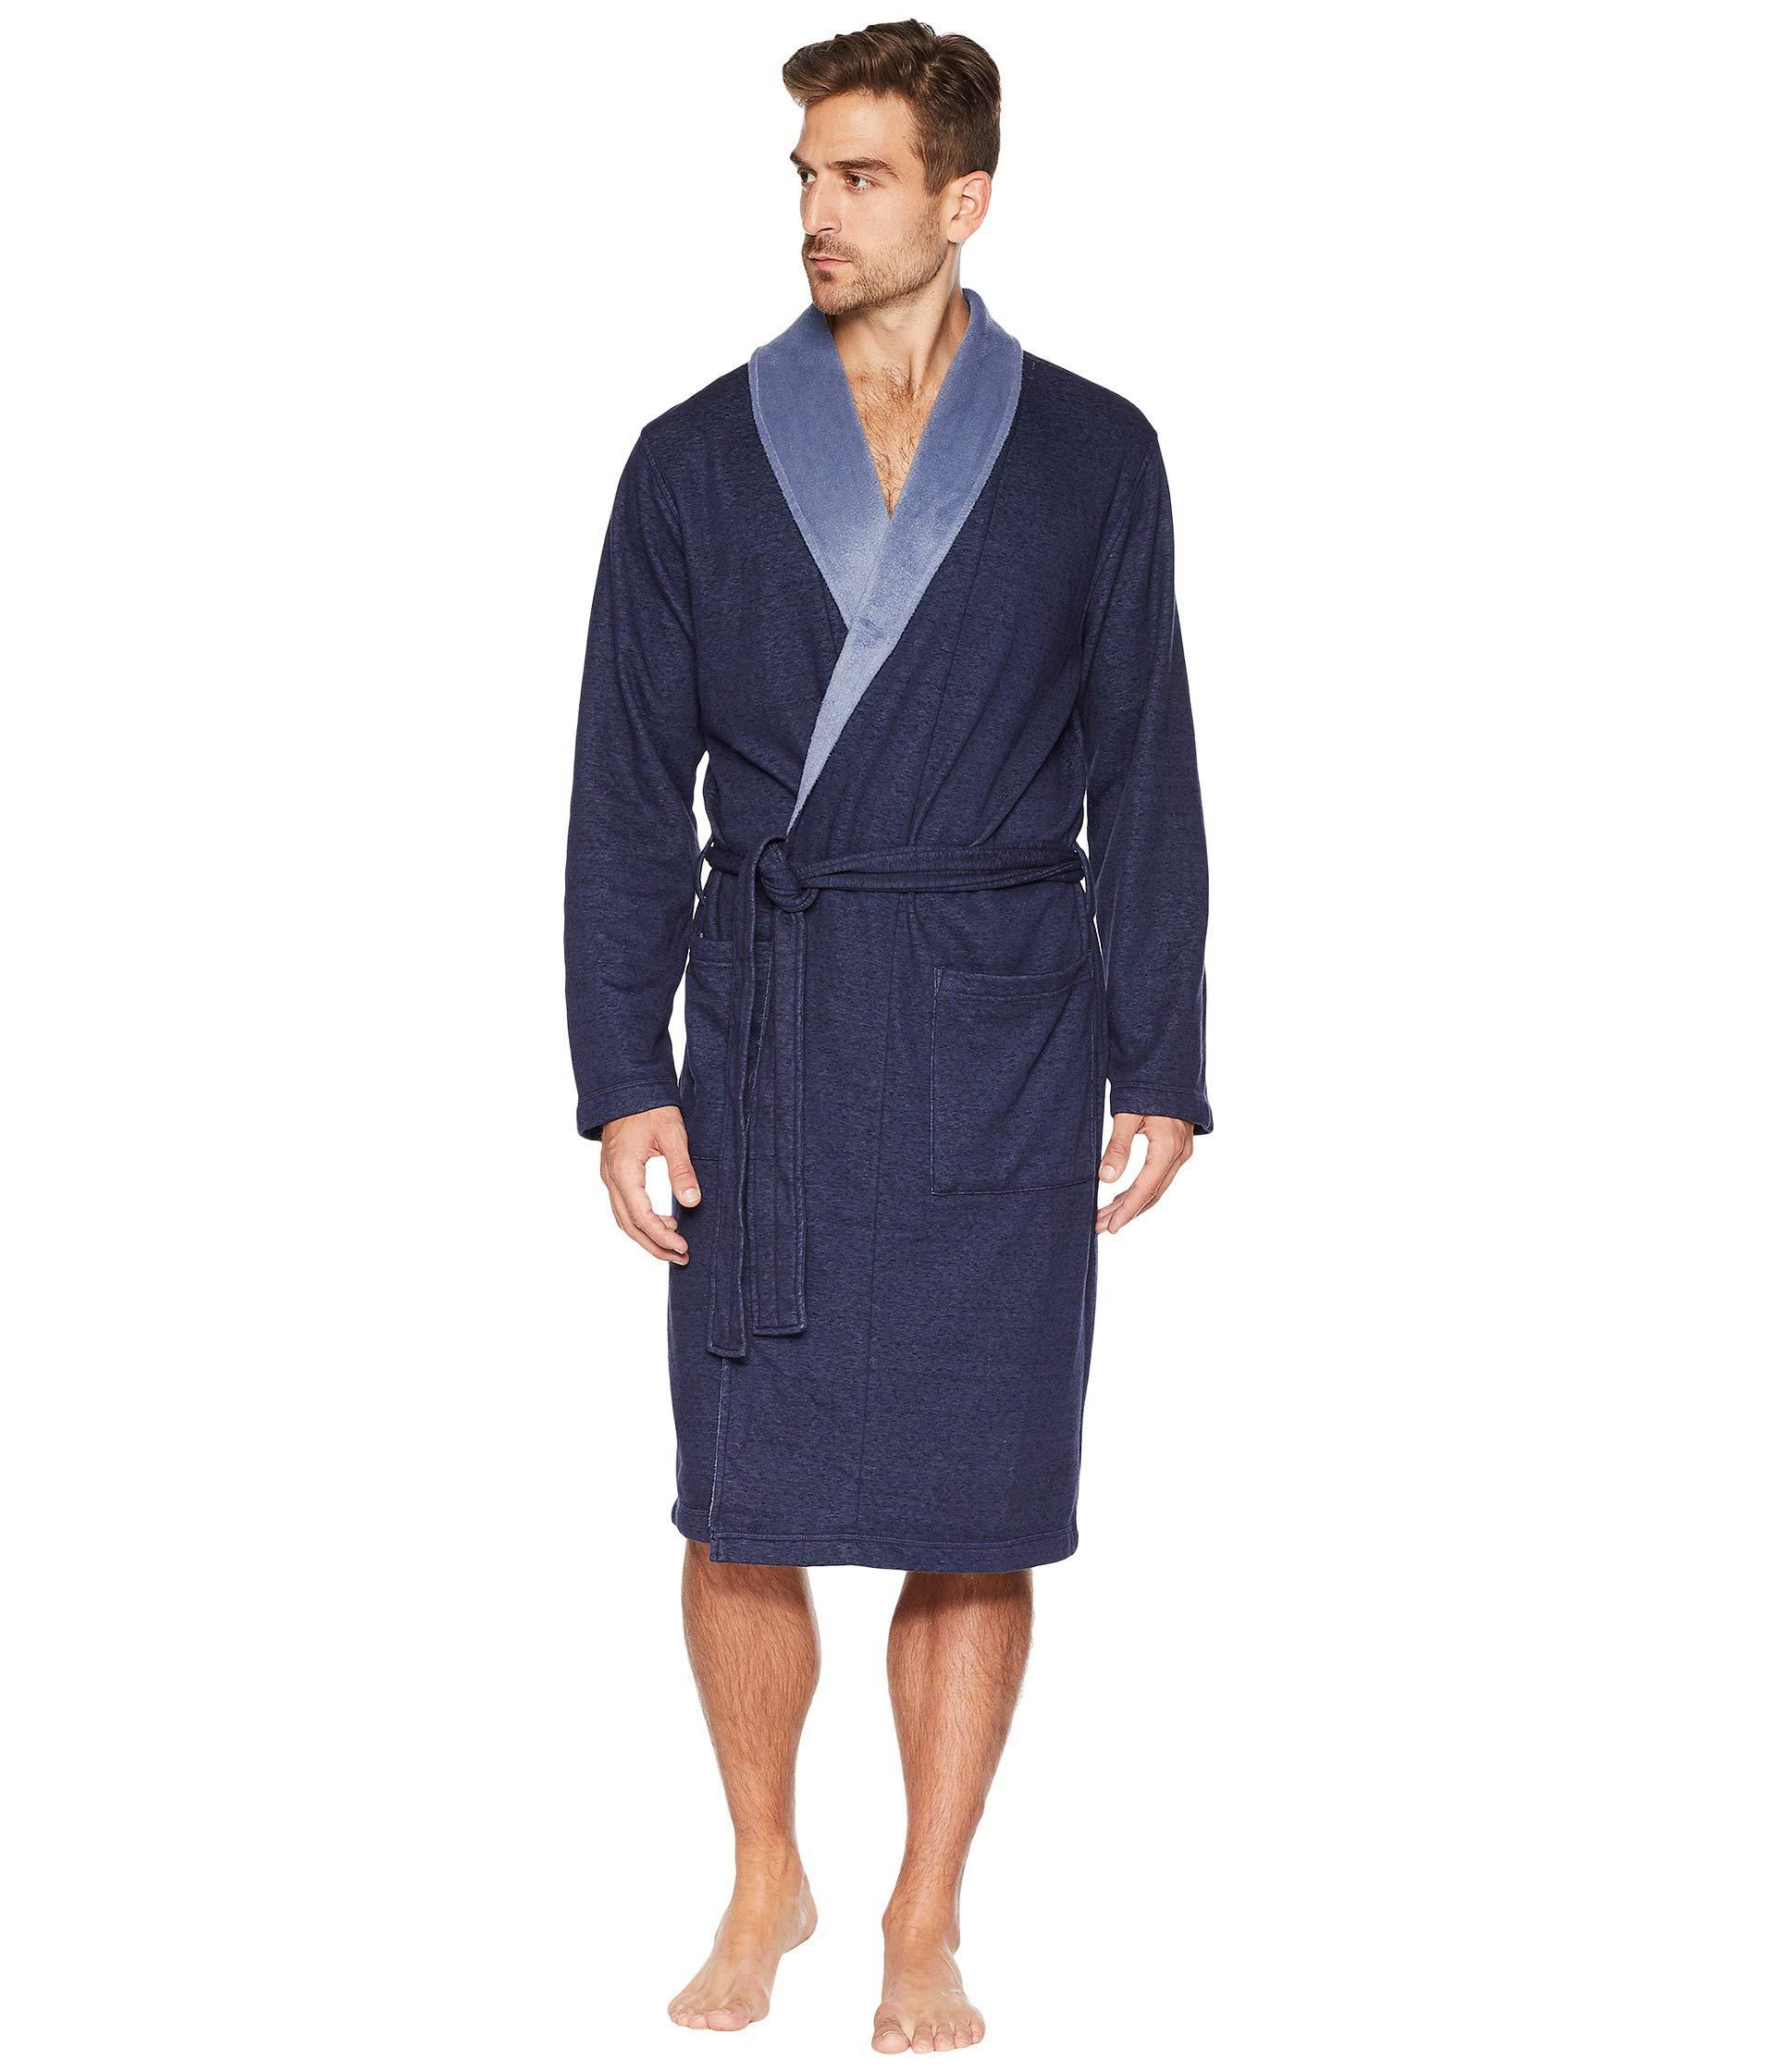 Lyst - UGG Robinson Robe (grey Heather) Men s Robe in Blue for Men 29512ce58